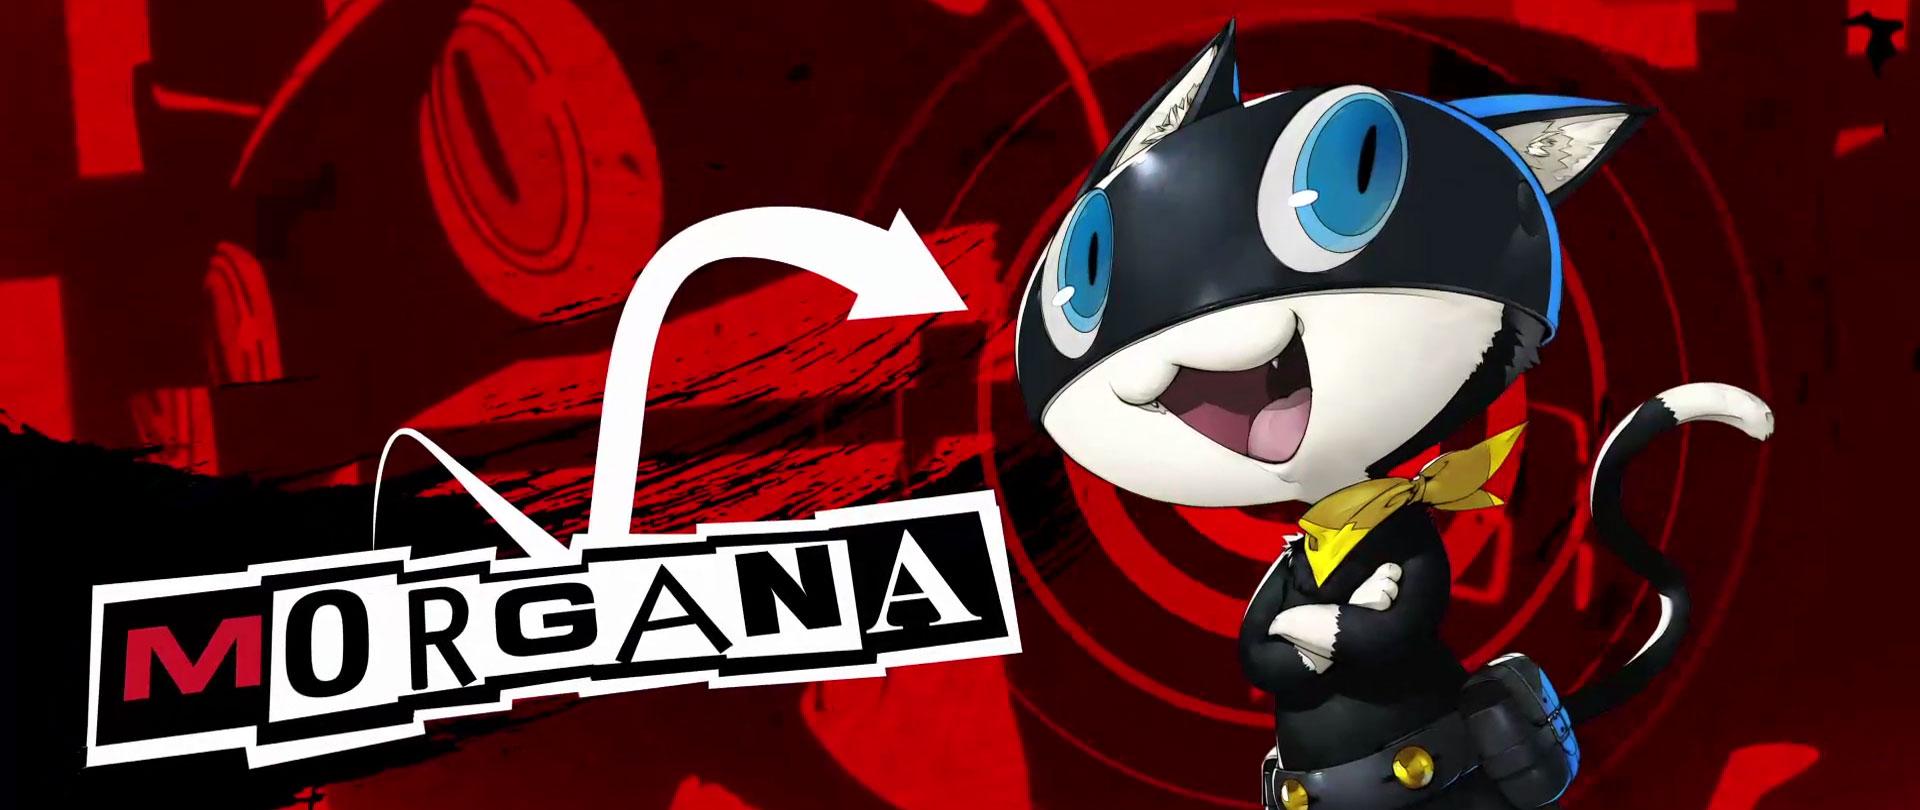 15 best Rhythm Thief images on Pinterest | Video games ... |Phantom Thief Silver Cat